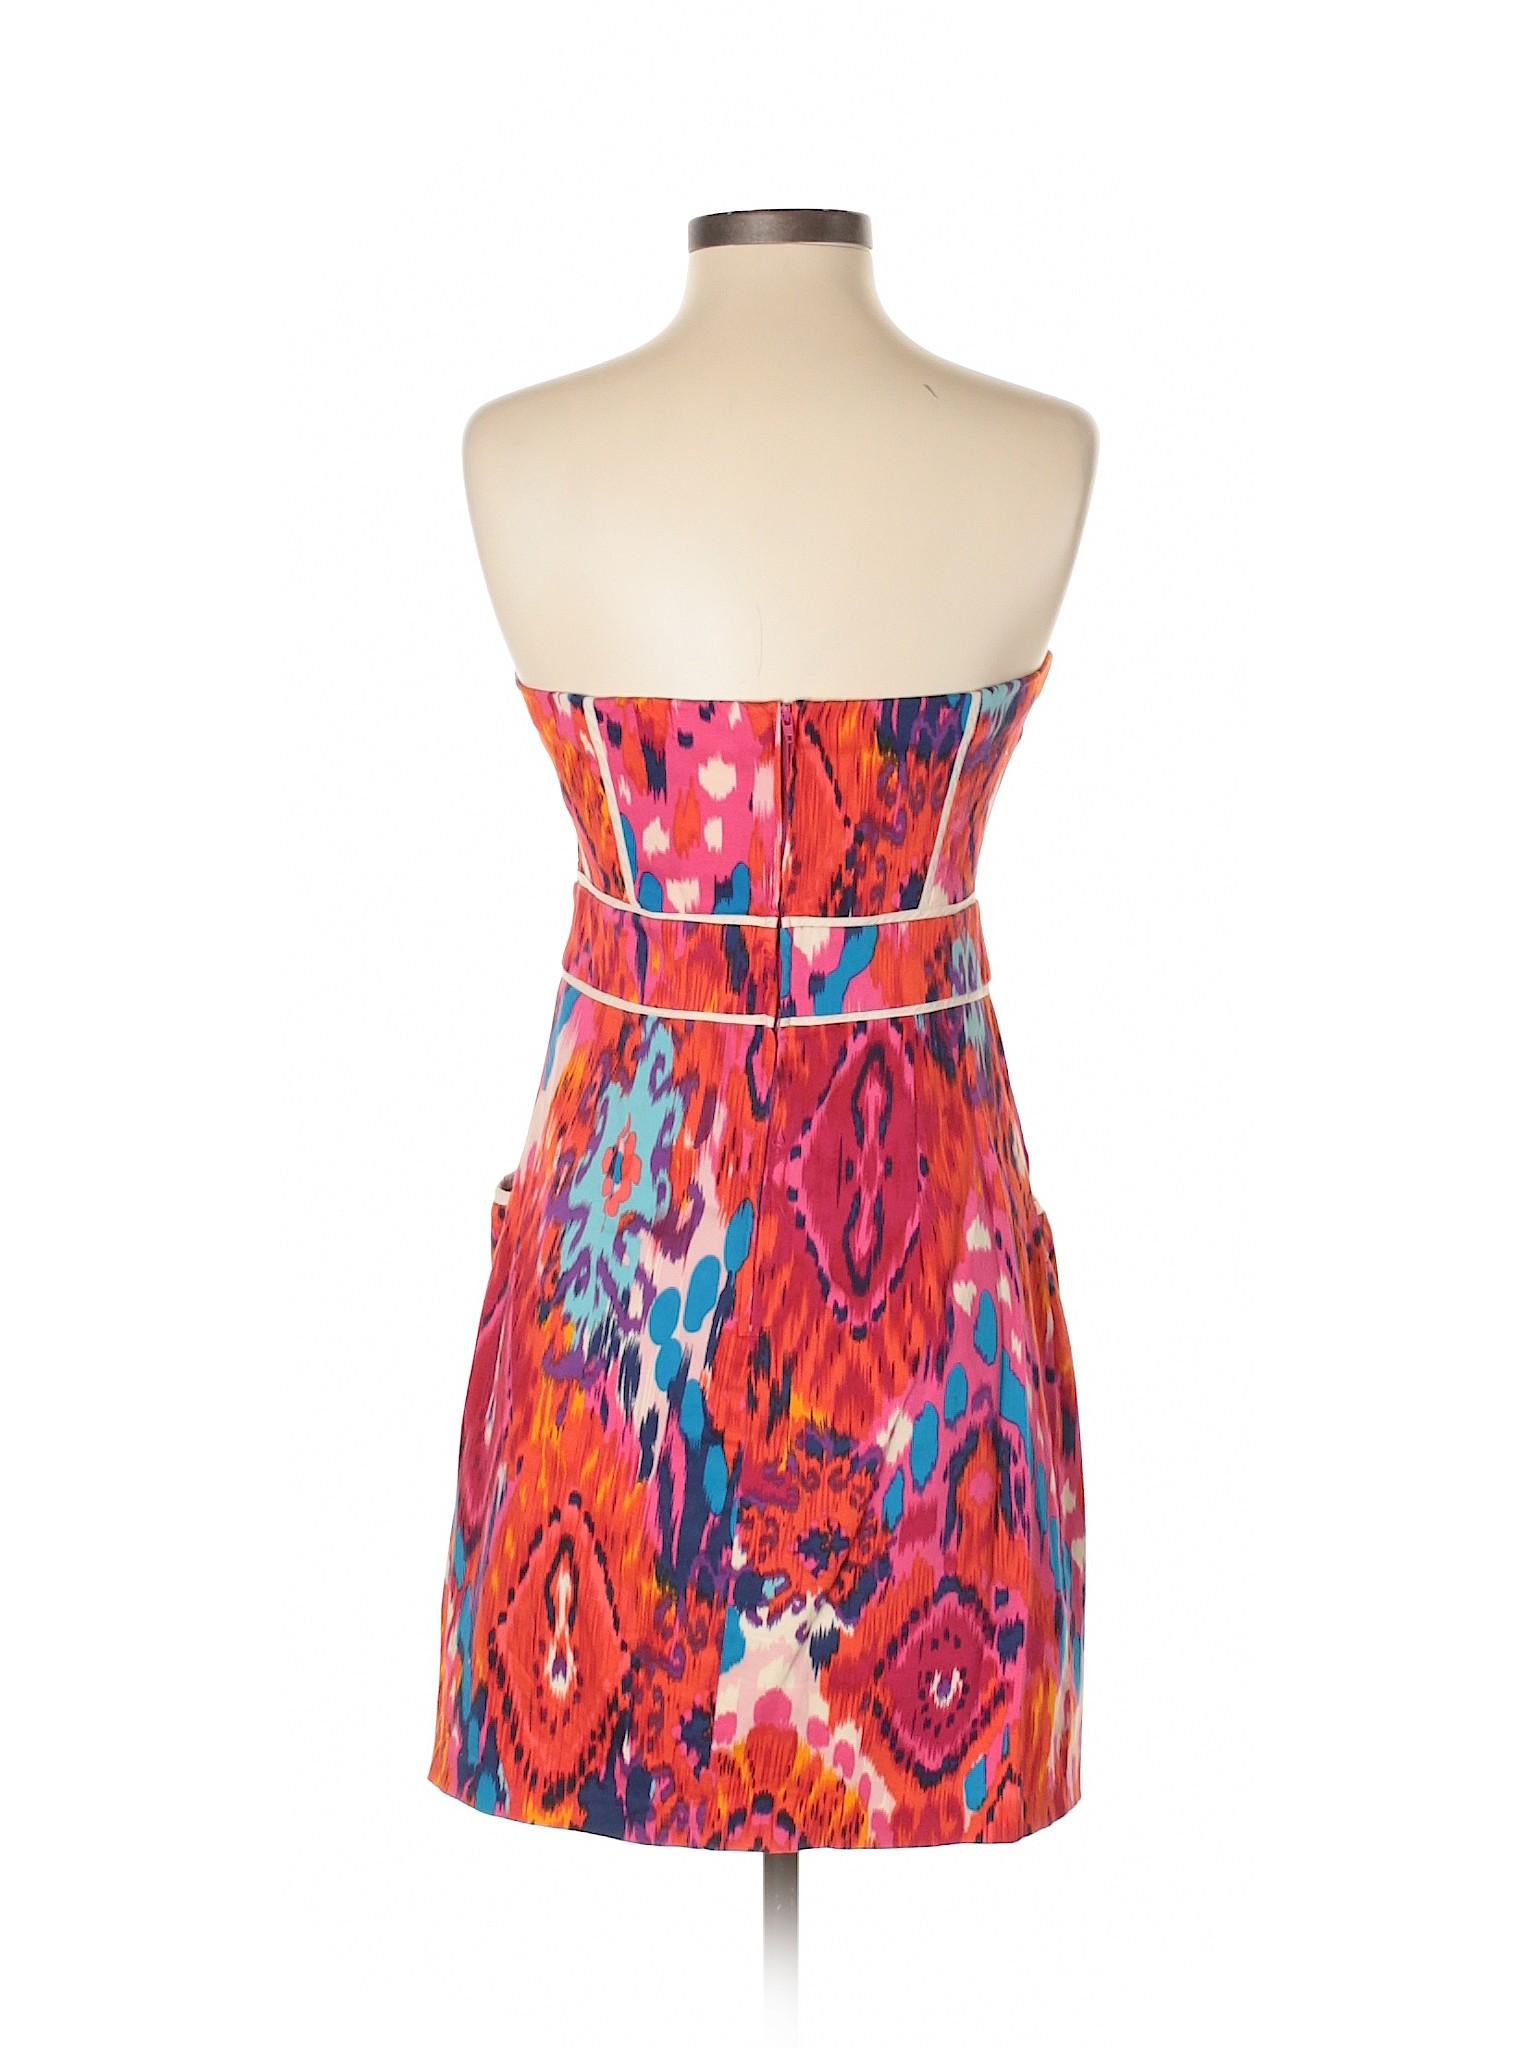 Smart Selling B Selling Smart Dress B Selling Casual Casual Selling Smart B Smart Dress Dress Casual Casual B qtZYwA